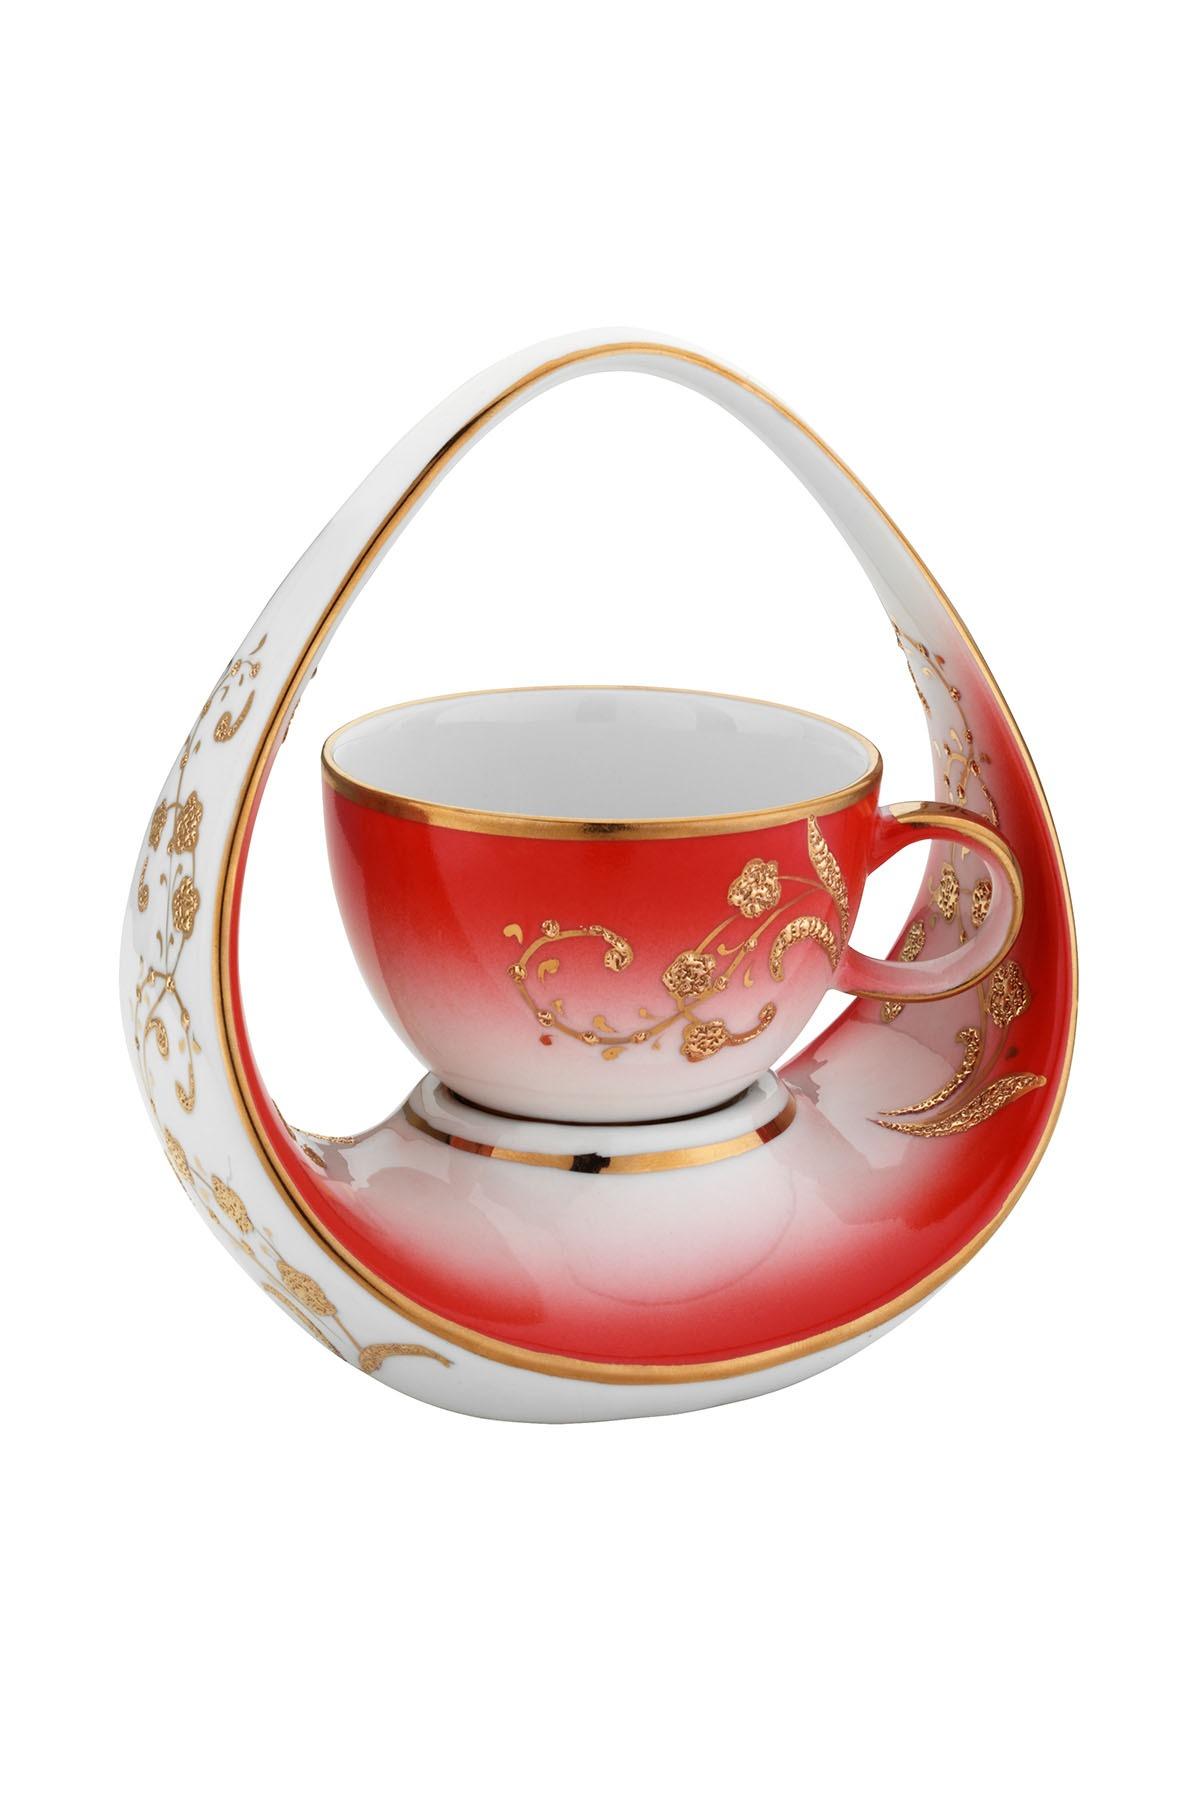 Kütahya Porselen - Kütahya Porselen El Yapimi Sepet Kahve Fin. kırmızı